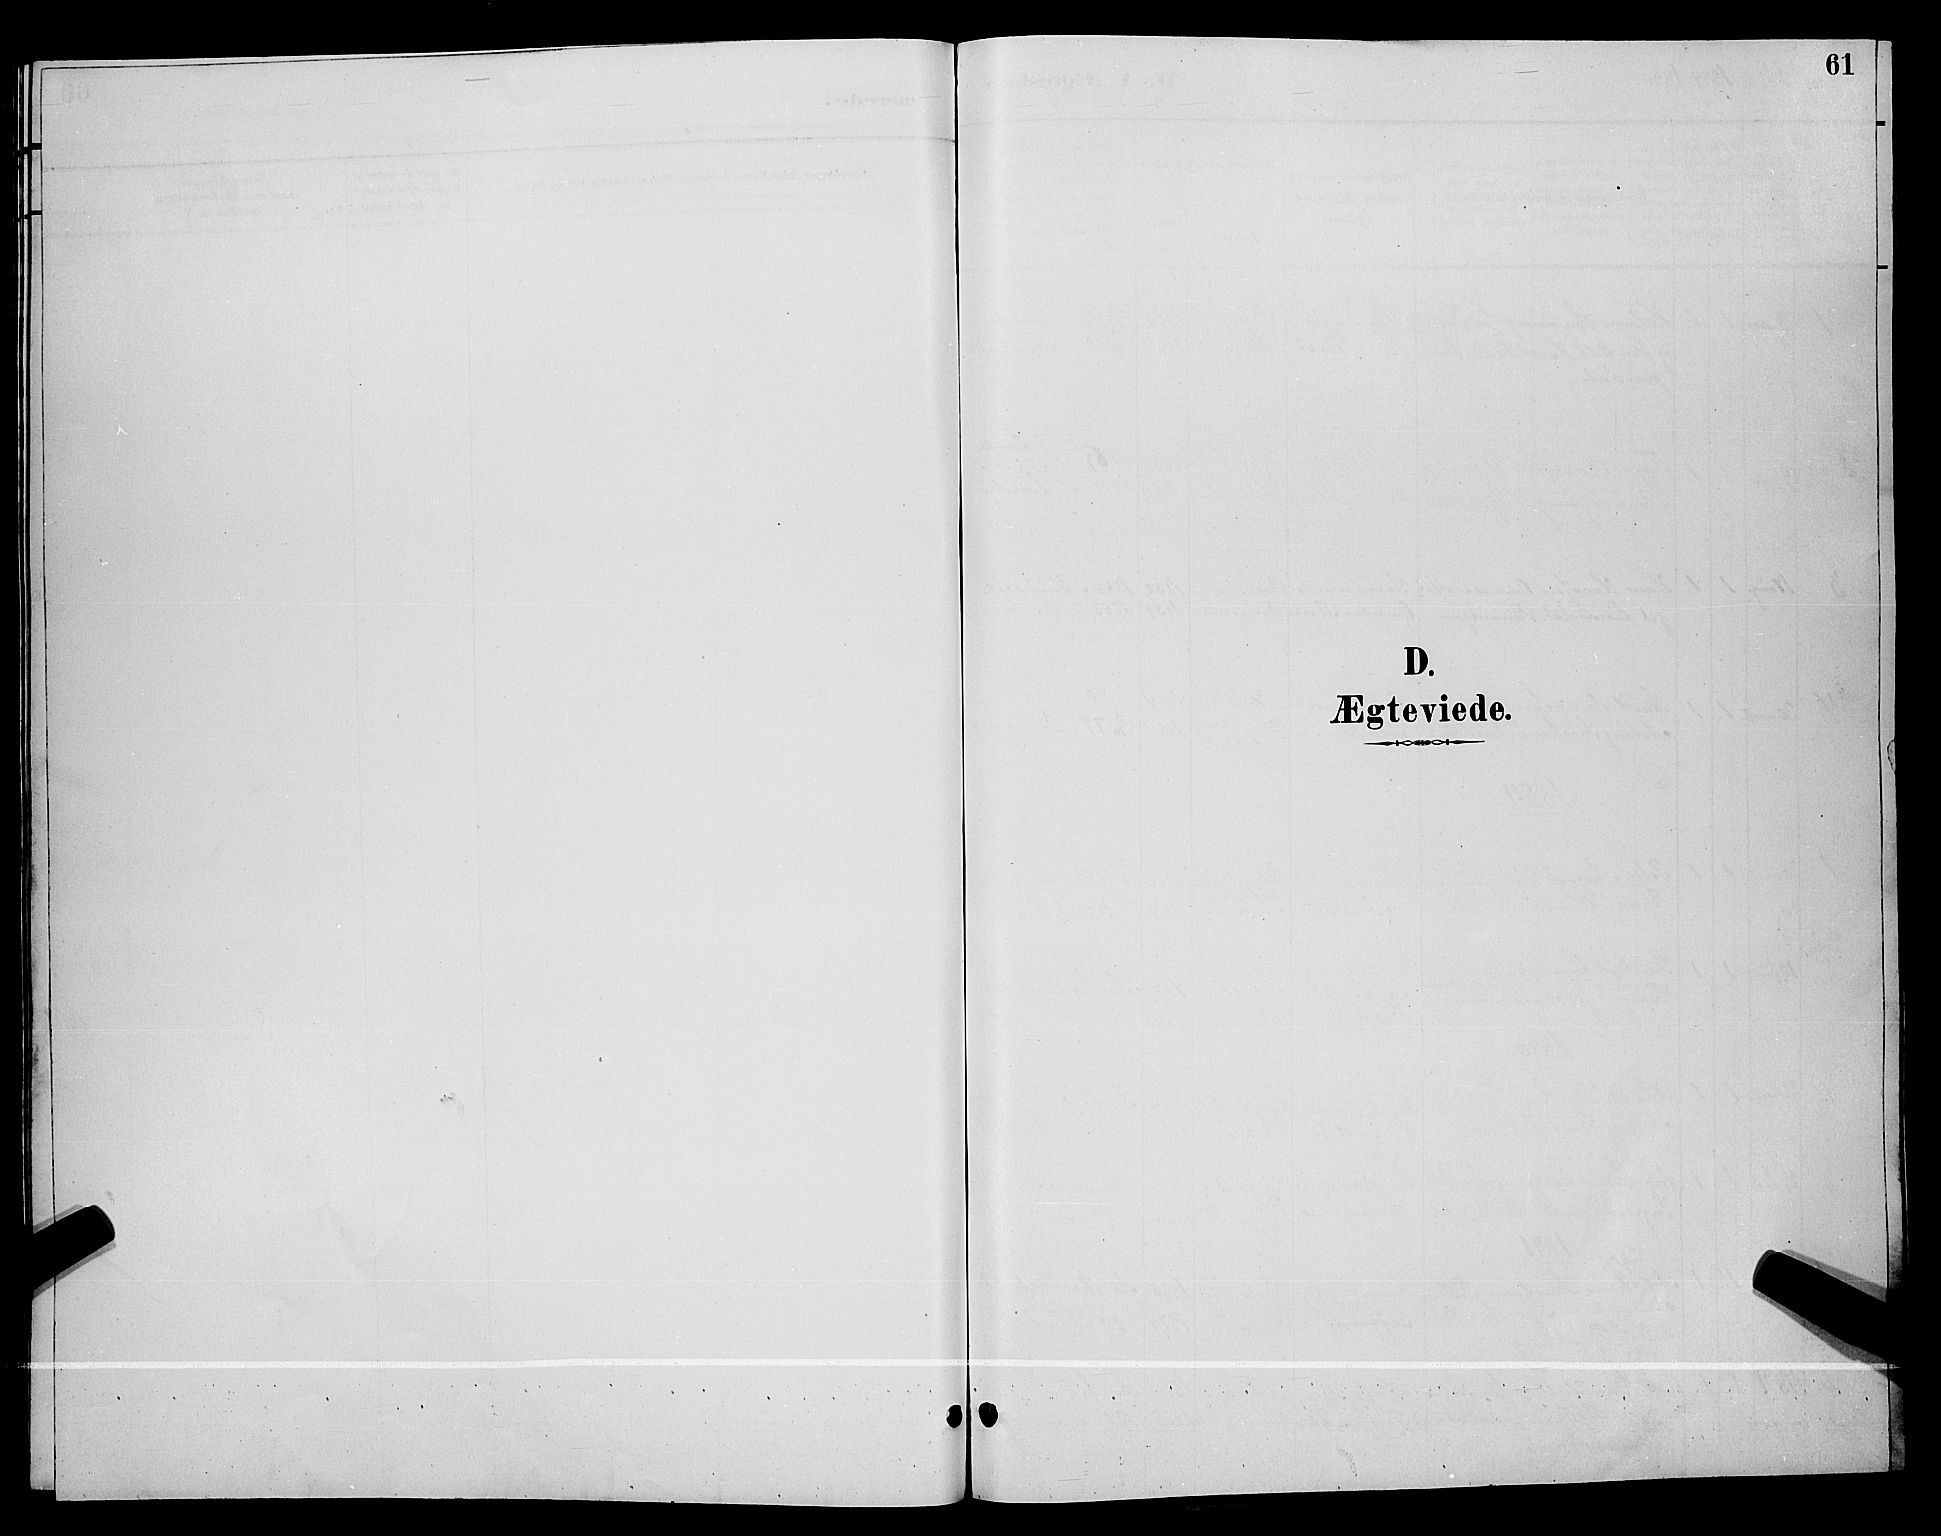 SAKO, Lunde kirkebøker, G/Gb/L0002: Klokkerbok nr. II 2, 1888-1895, s. 61